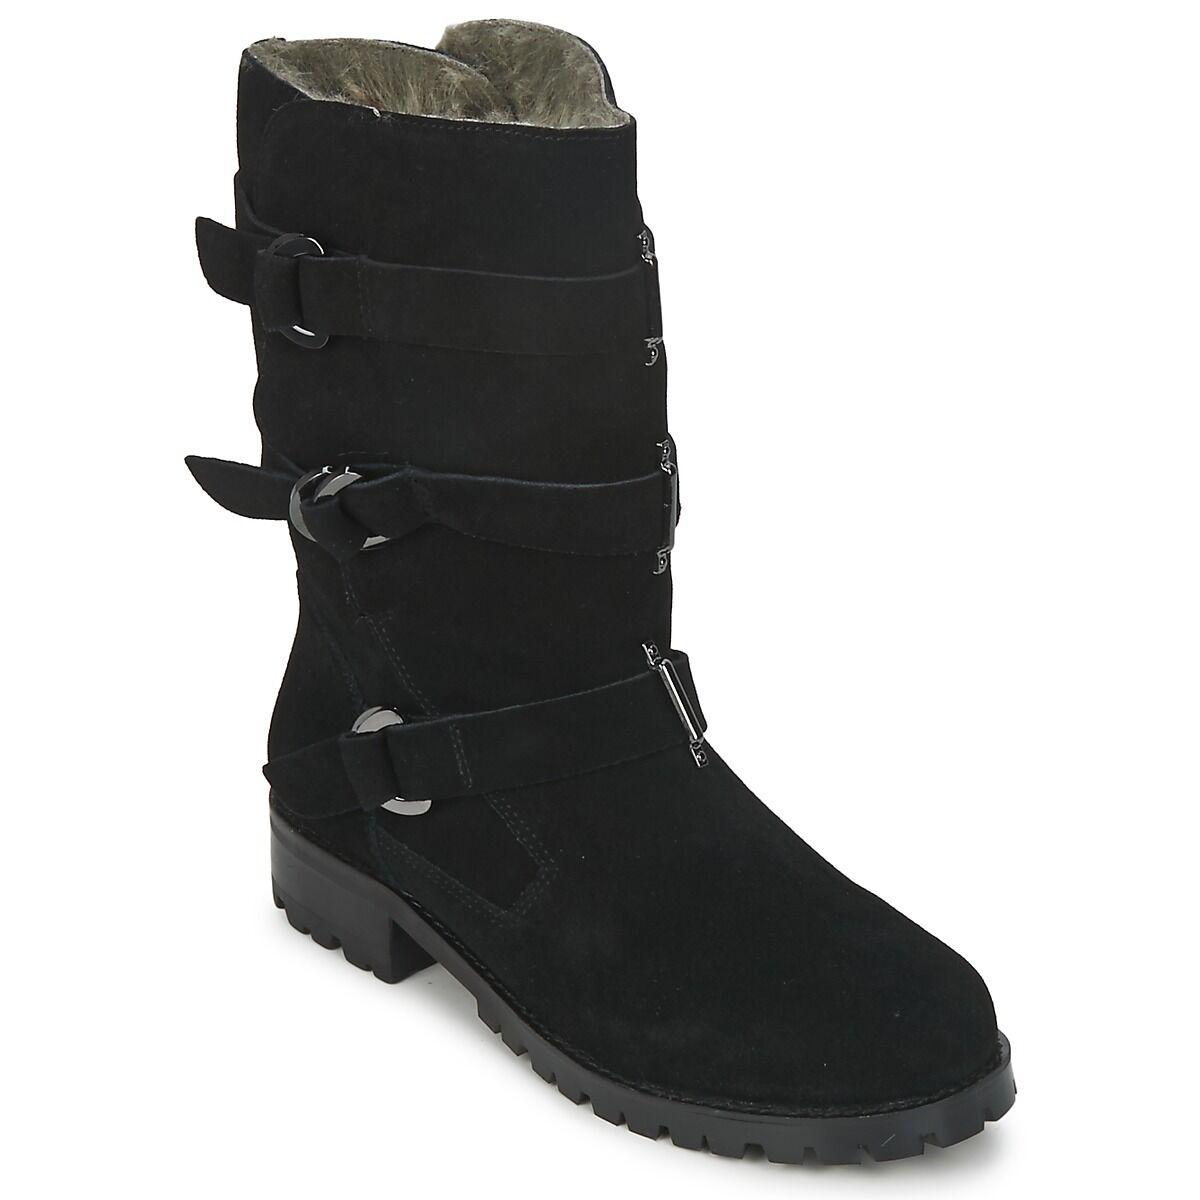 KG BLACK Stiefel /   / FUR LINED   UK 3 / 4   EU 36 / 37  NEW KURT GEIGER